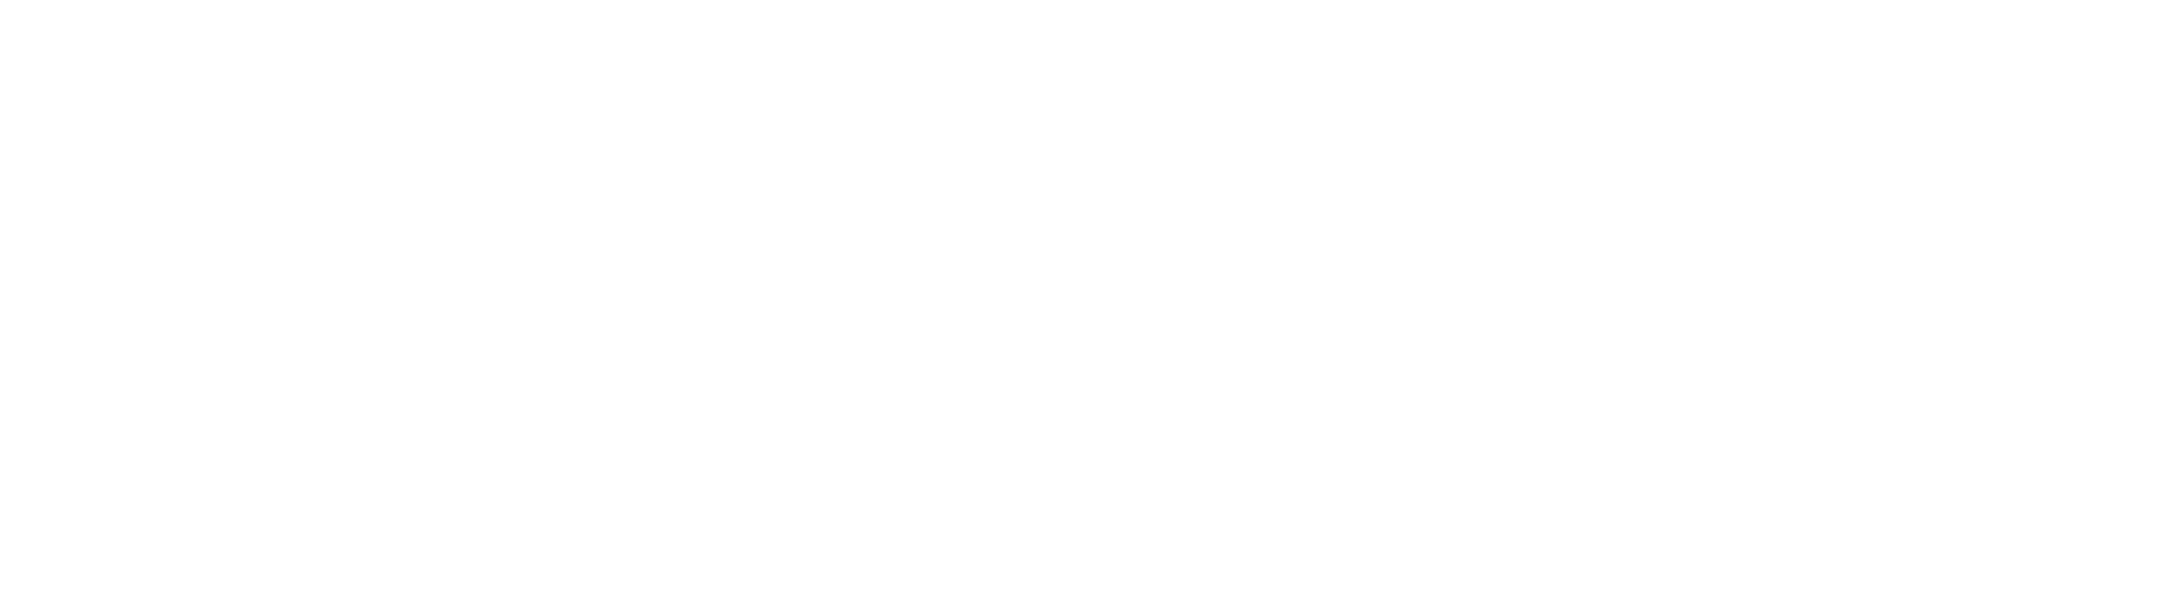 Revista Panorama Económico